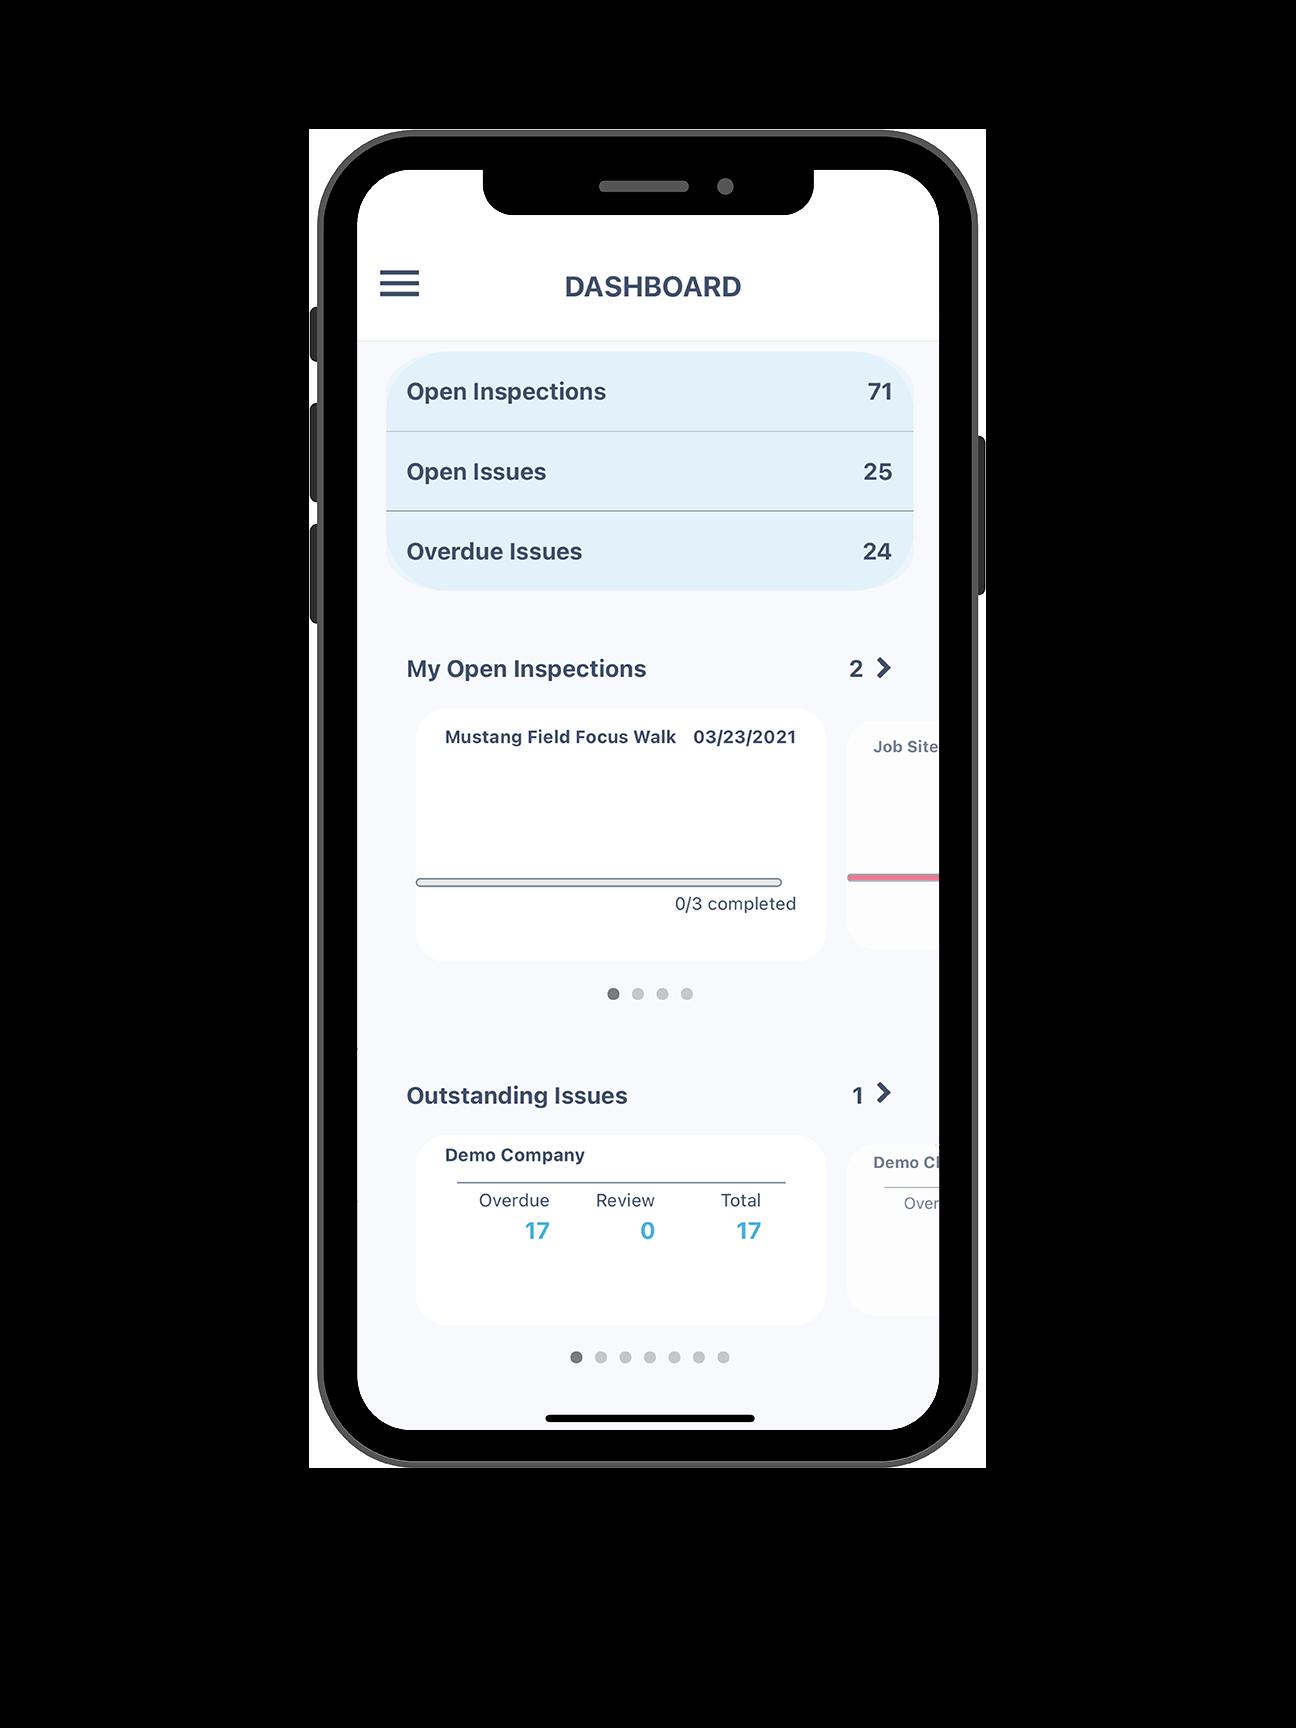 dashboard on iphone